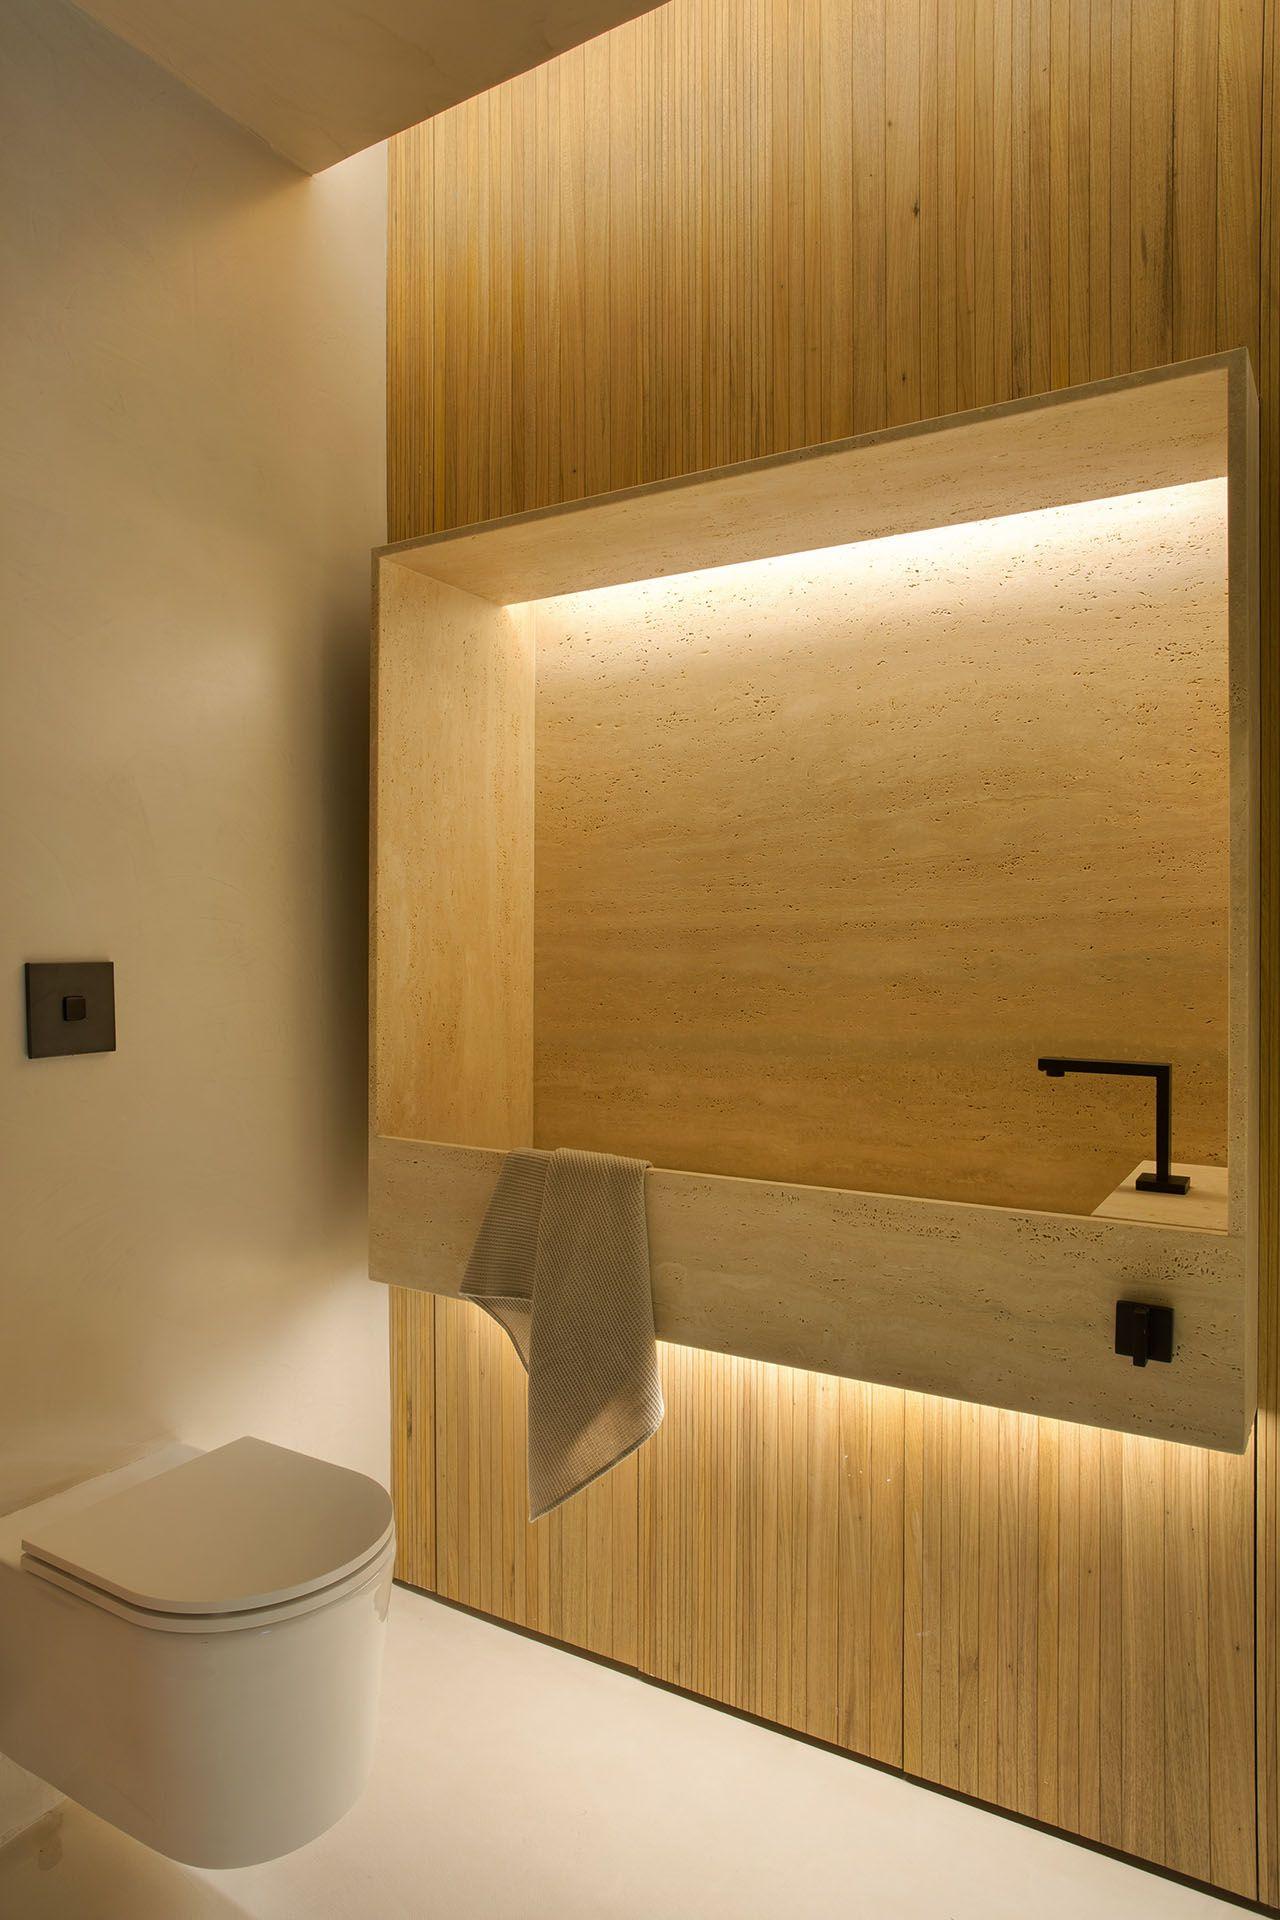 O design da cuba é o destaque do banheiro.